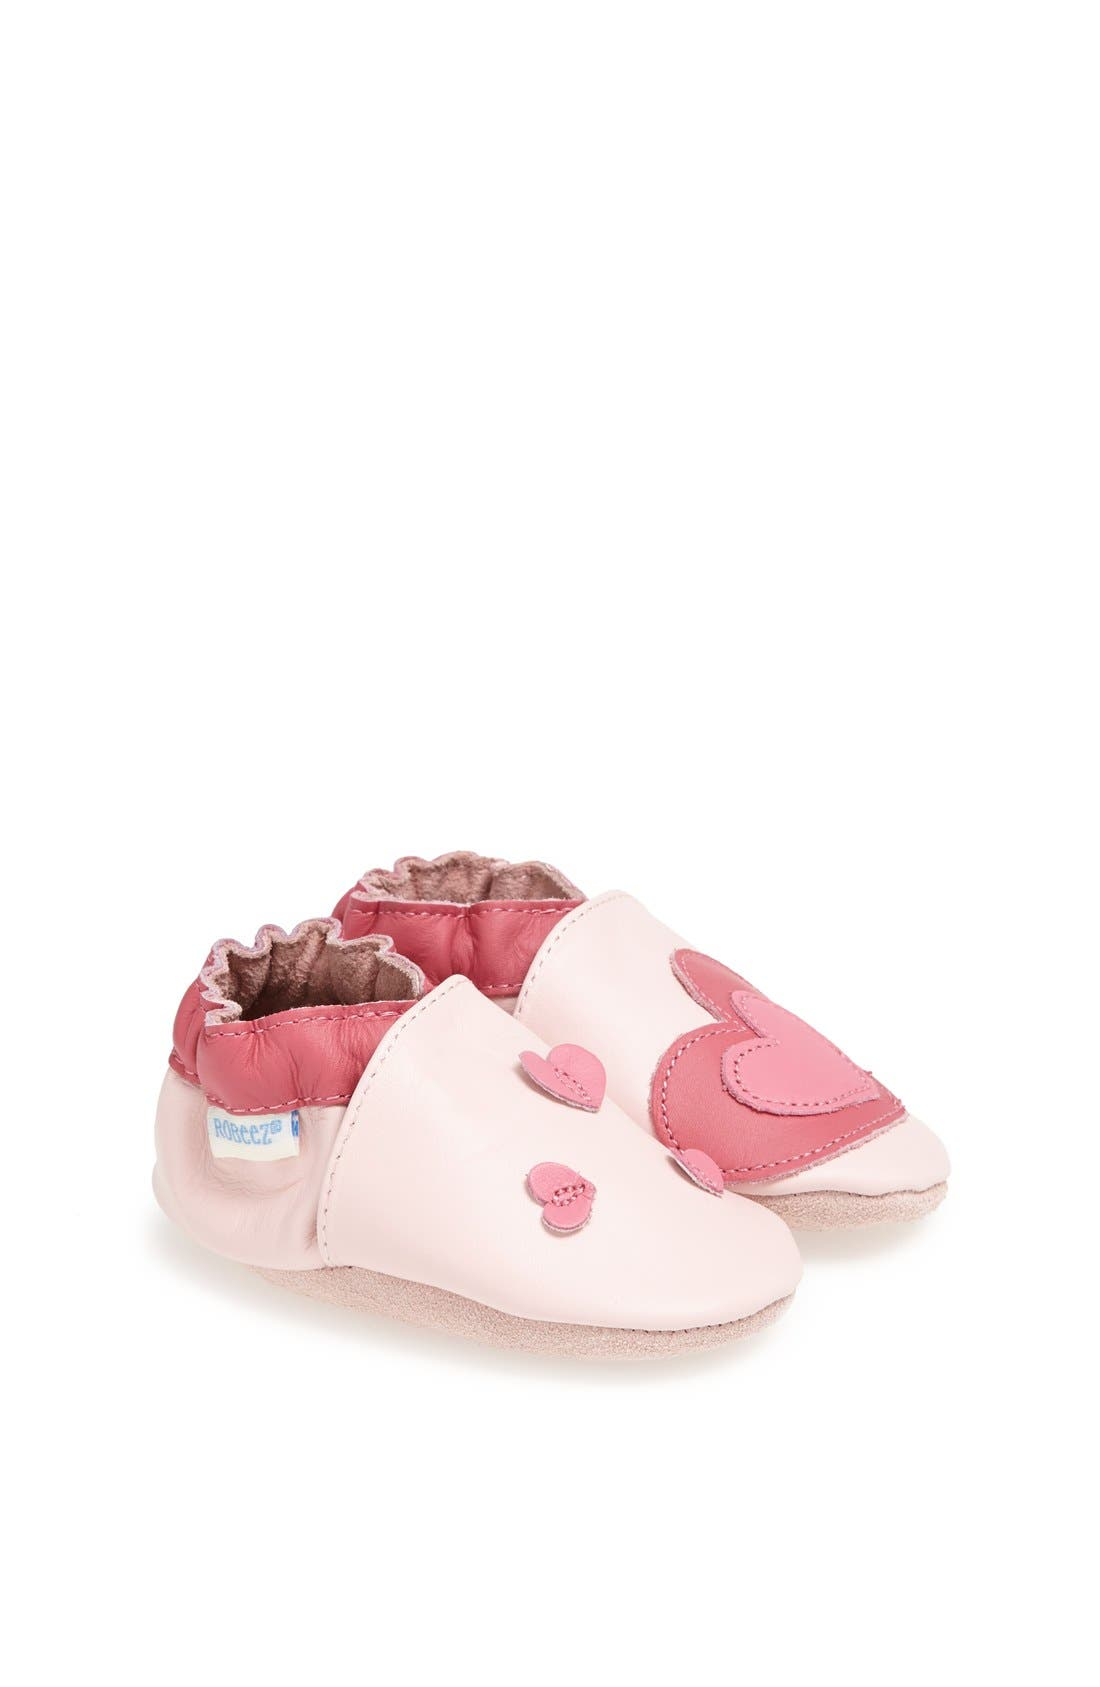 Alternate Image 1 Selected - Robeez® 'Sweet Heart' Crib Shoe (Baby & Walker)